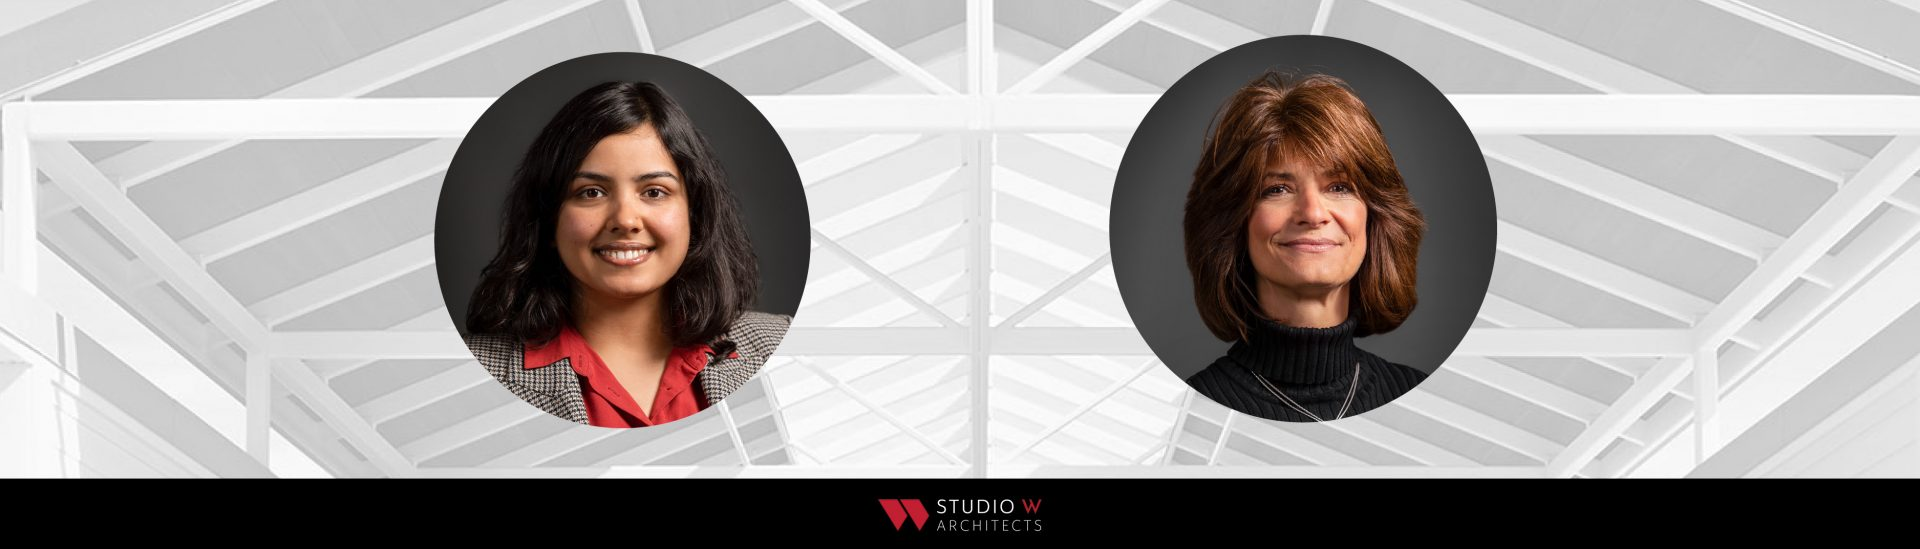 Deeksha Phadnis & Karol Gore Join Studio W Architects